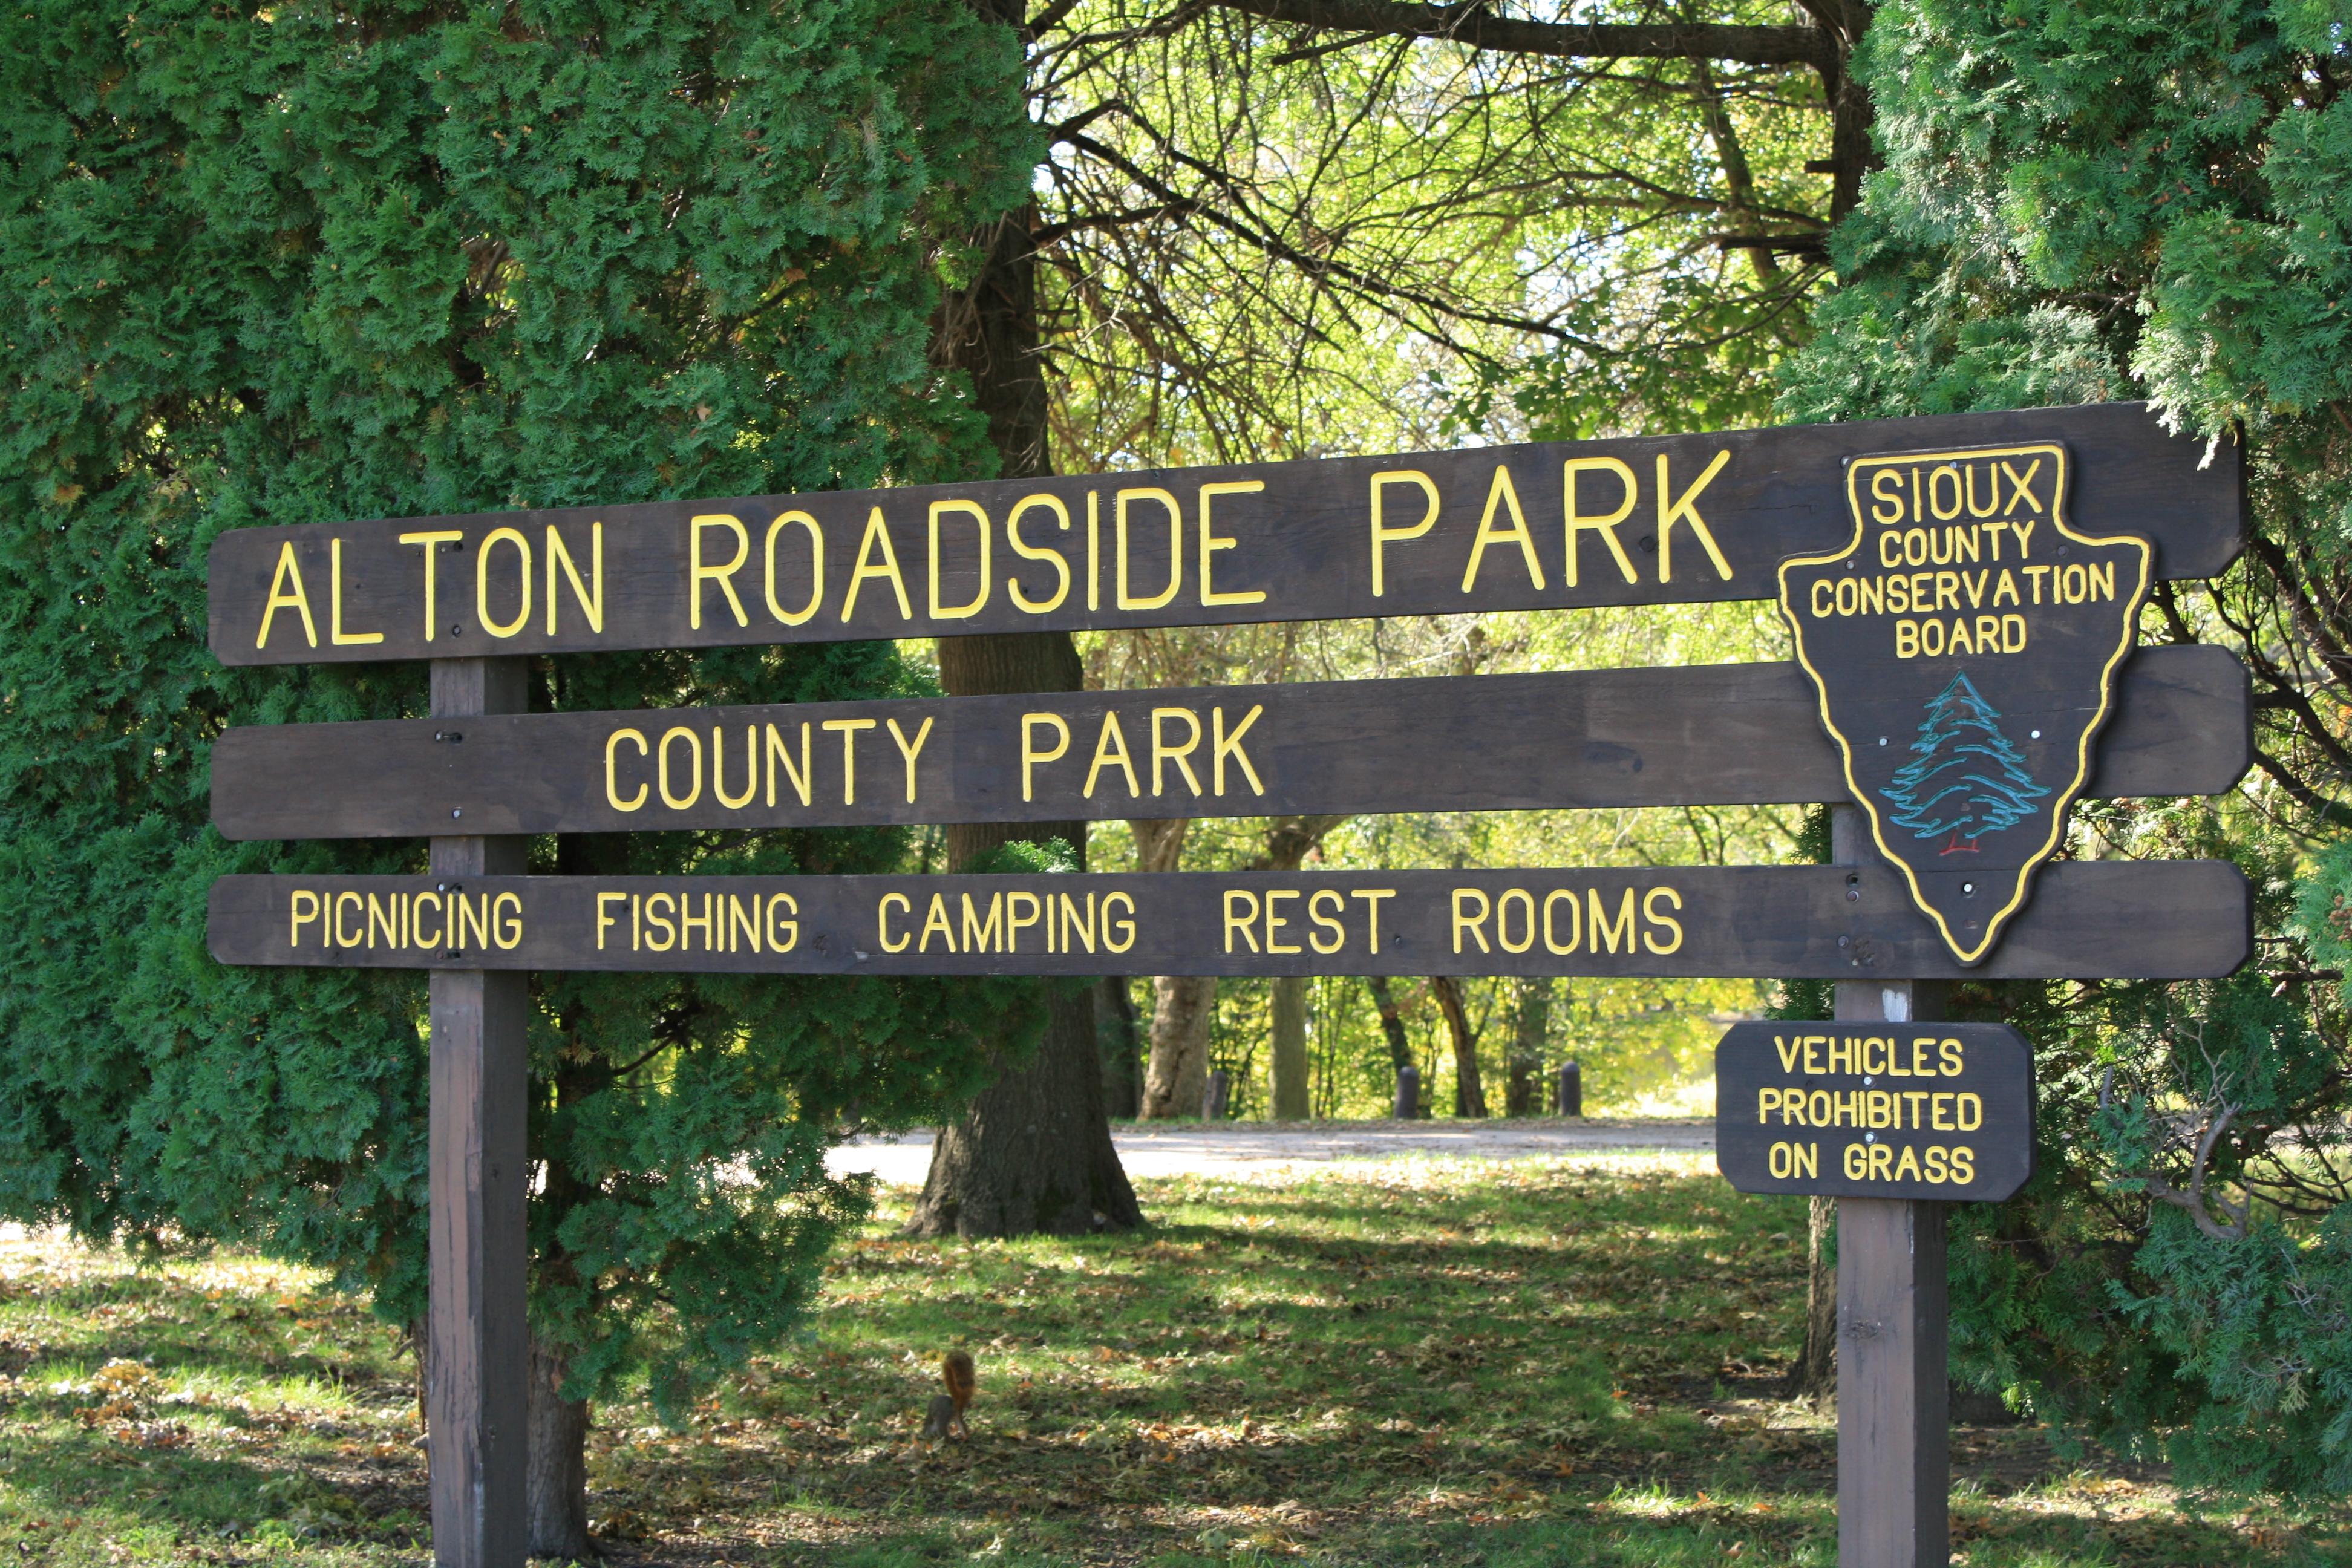 Alton Roadside Park